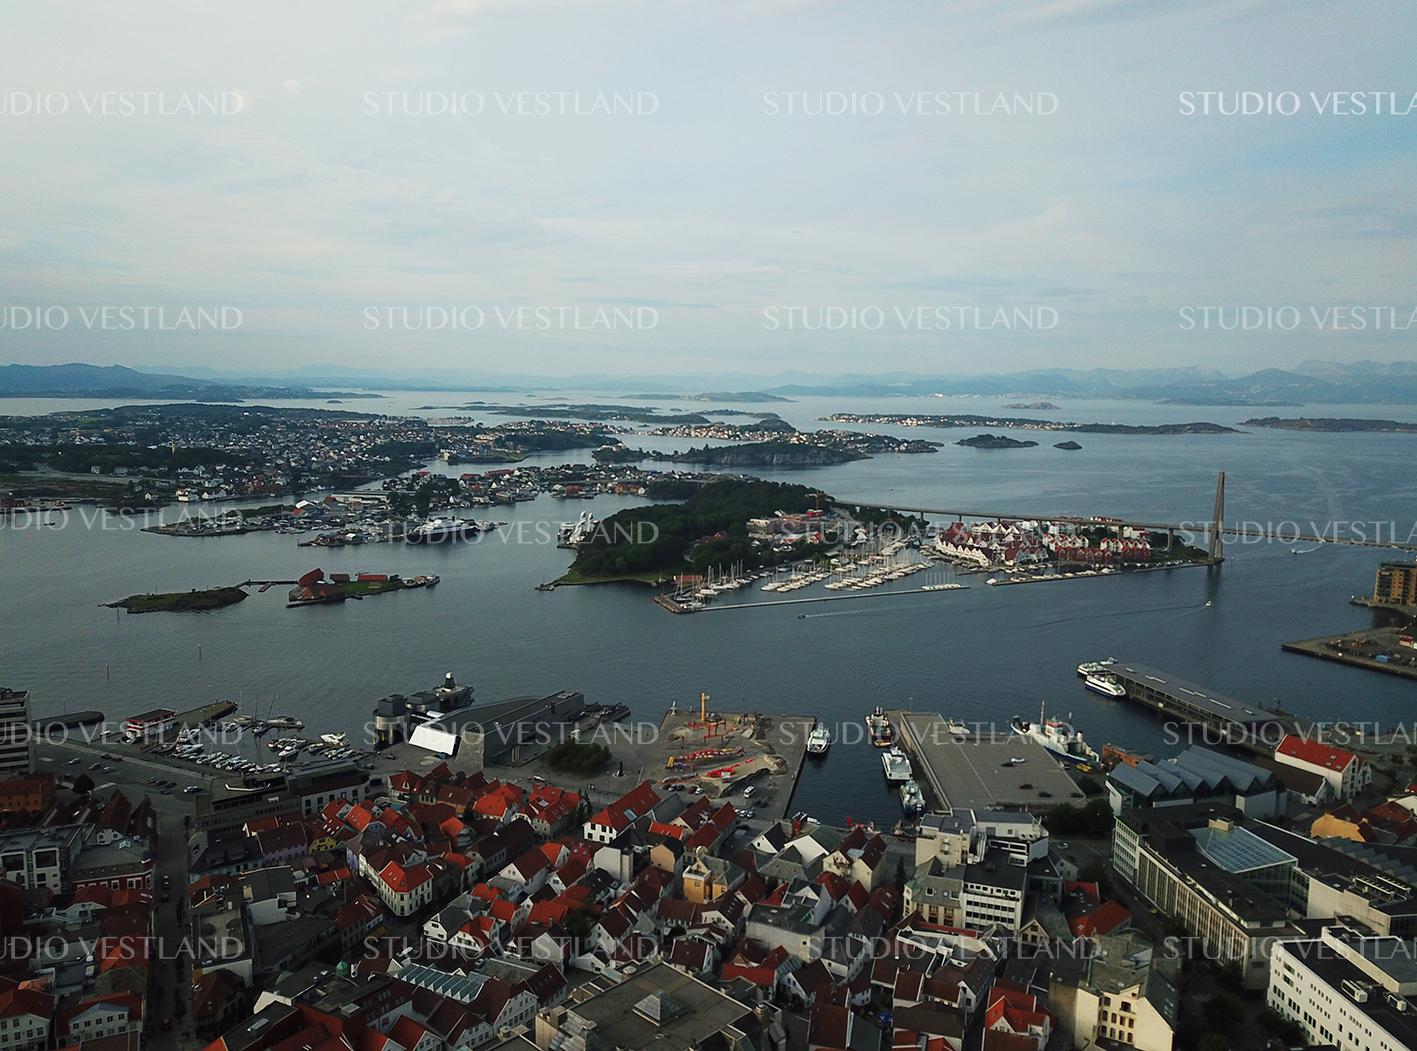 Studio Vestland - Stavanger 09